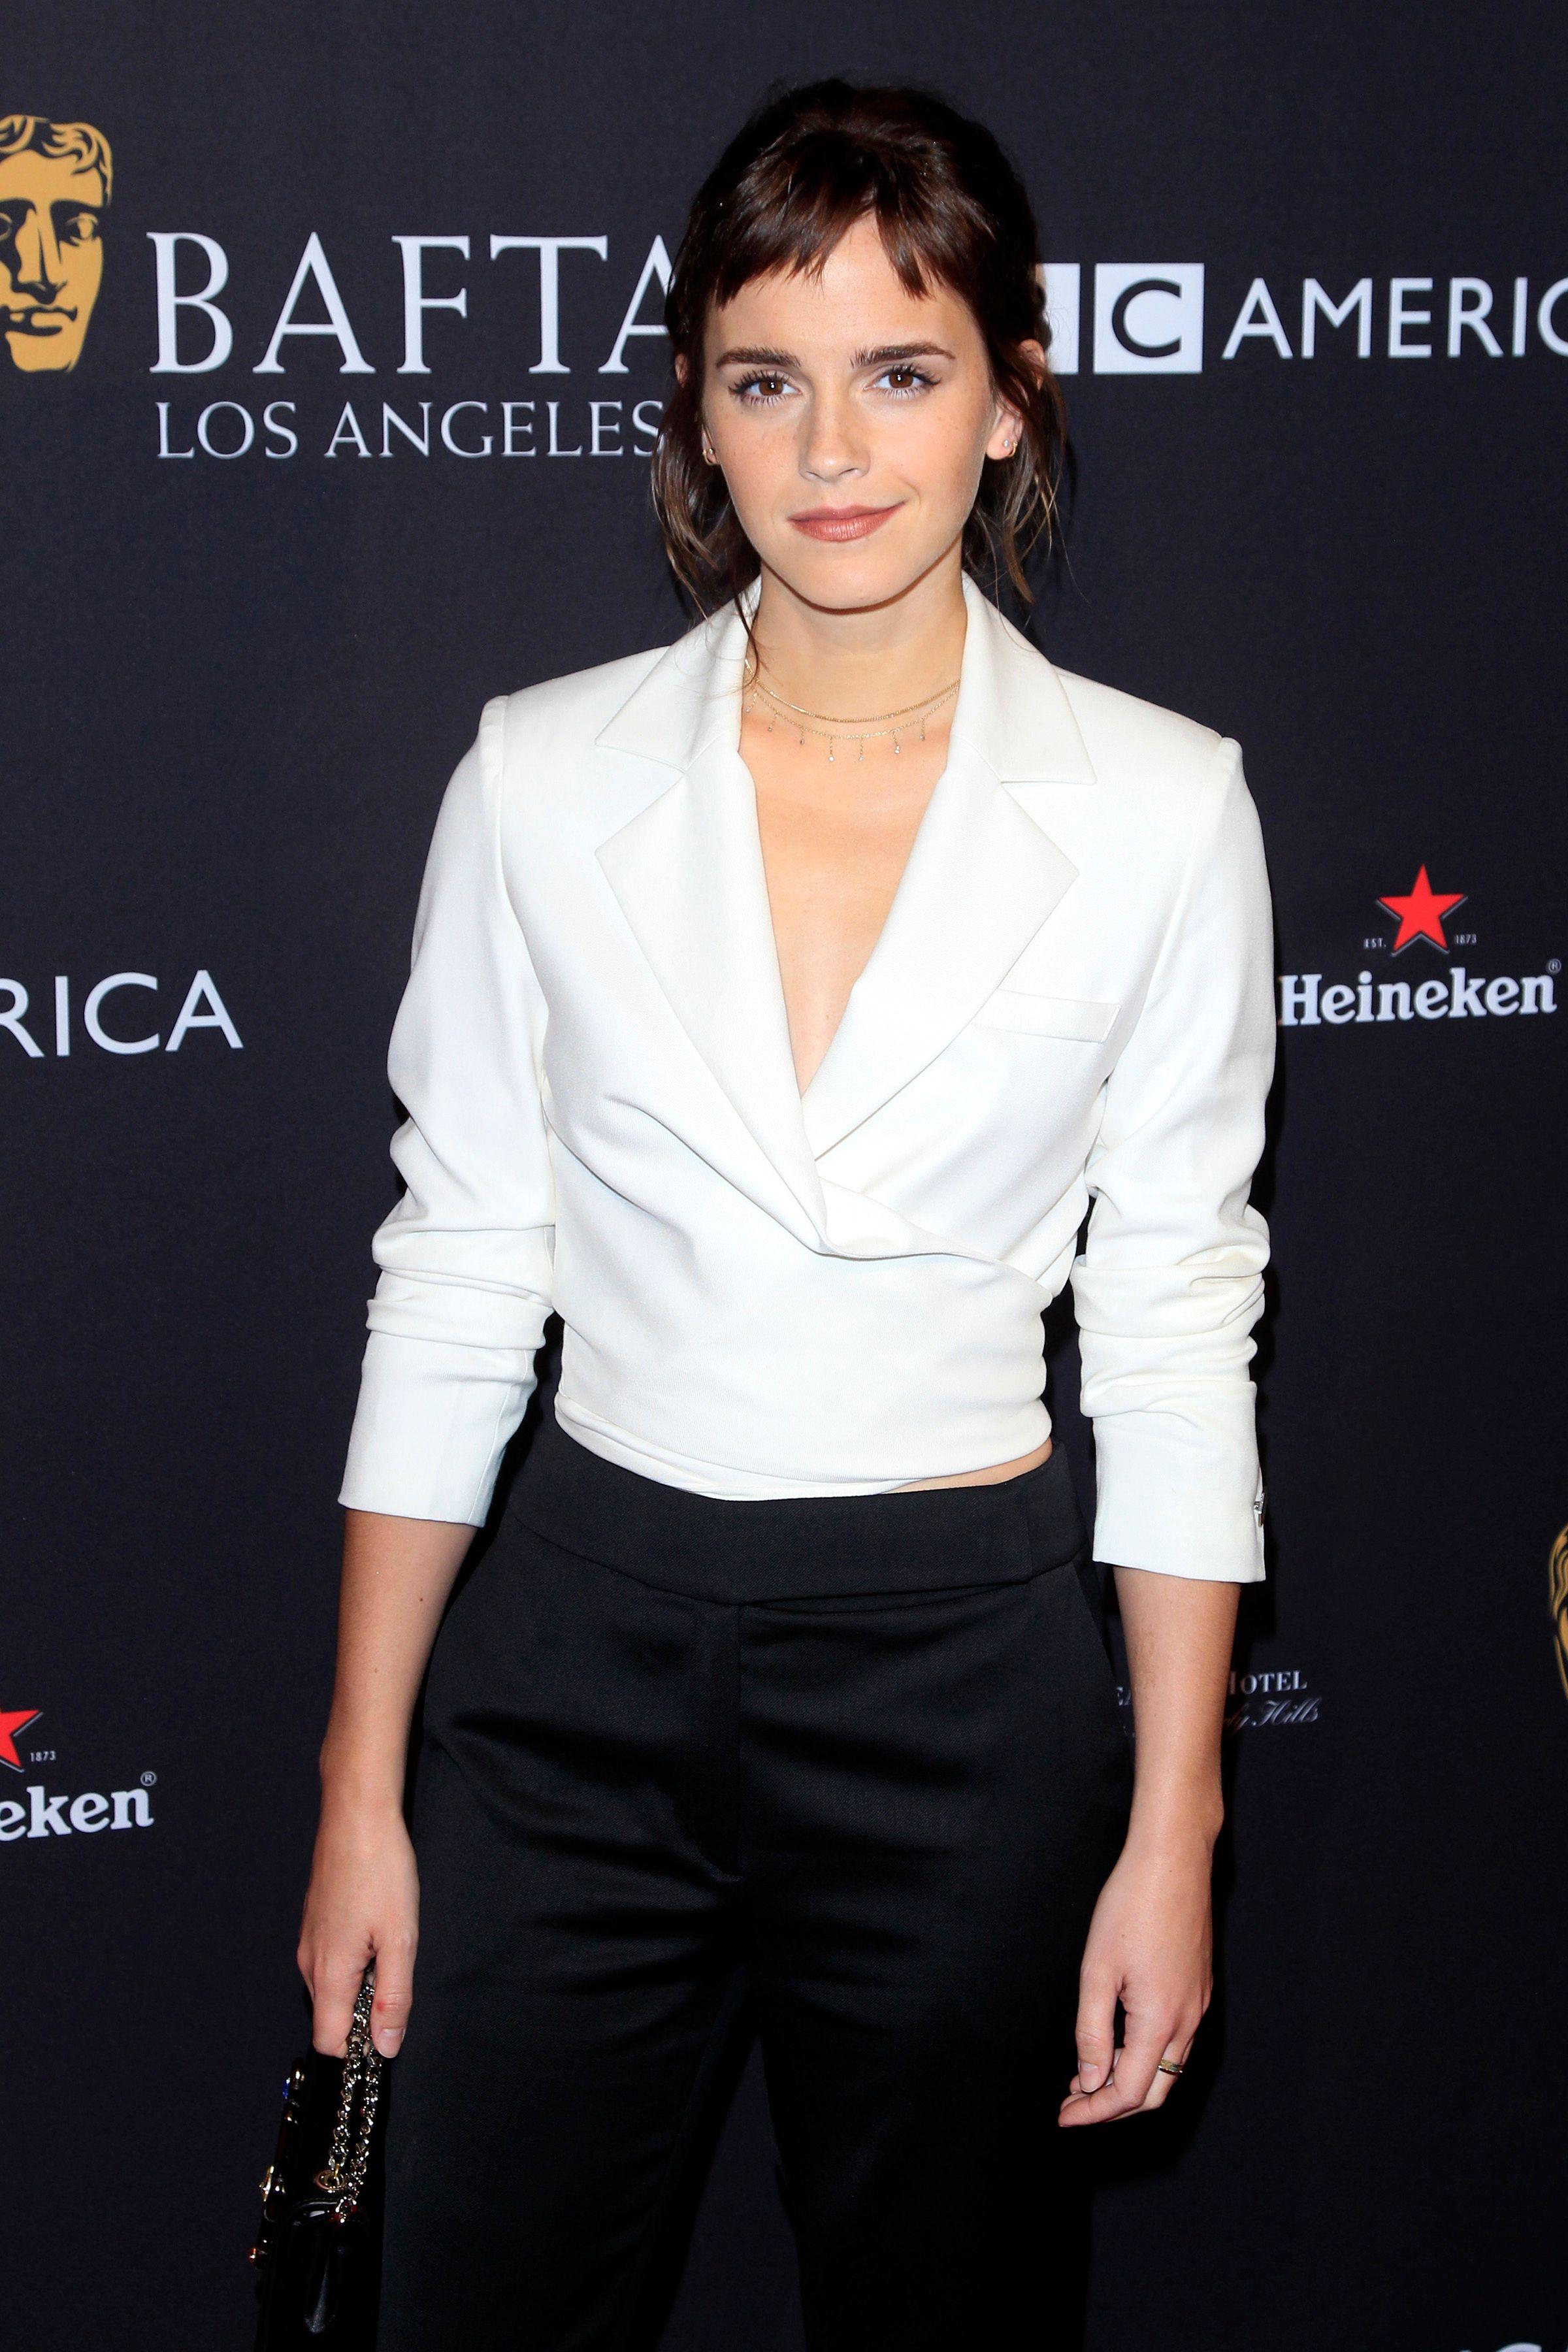 Emma Watson wears a white shirt and black pants.